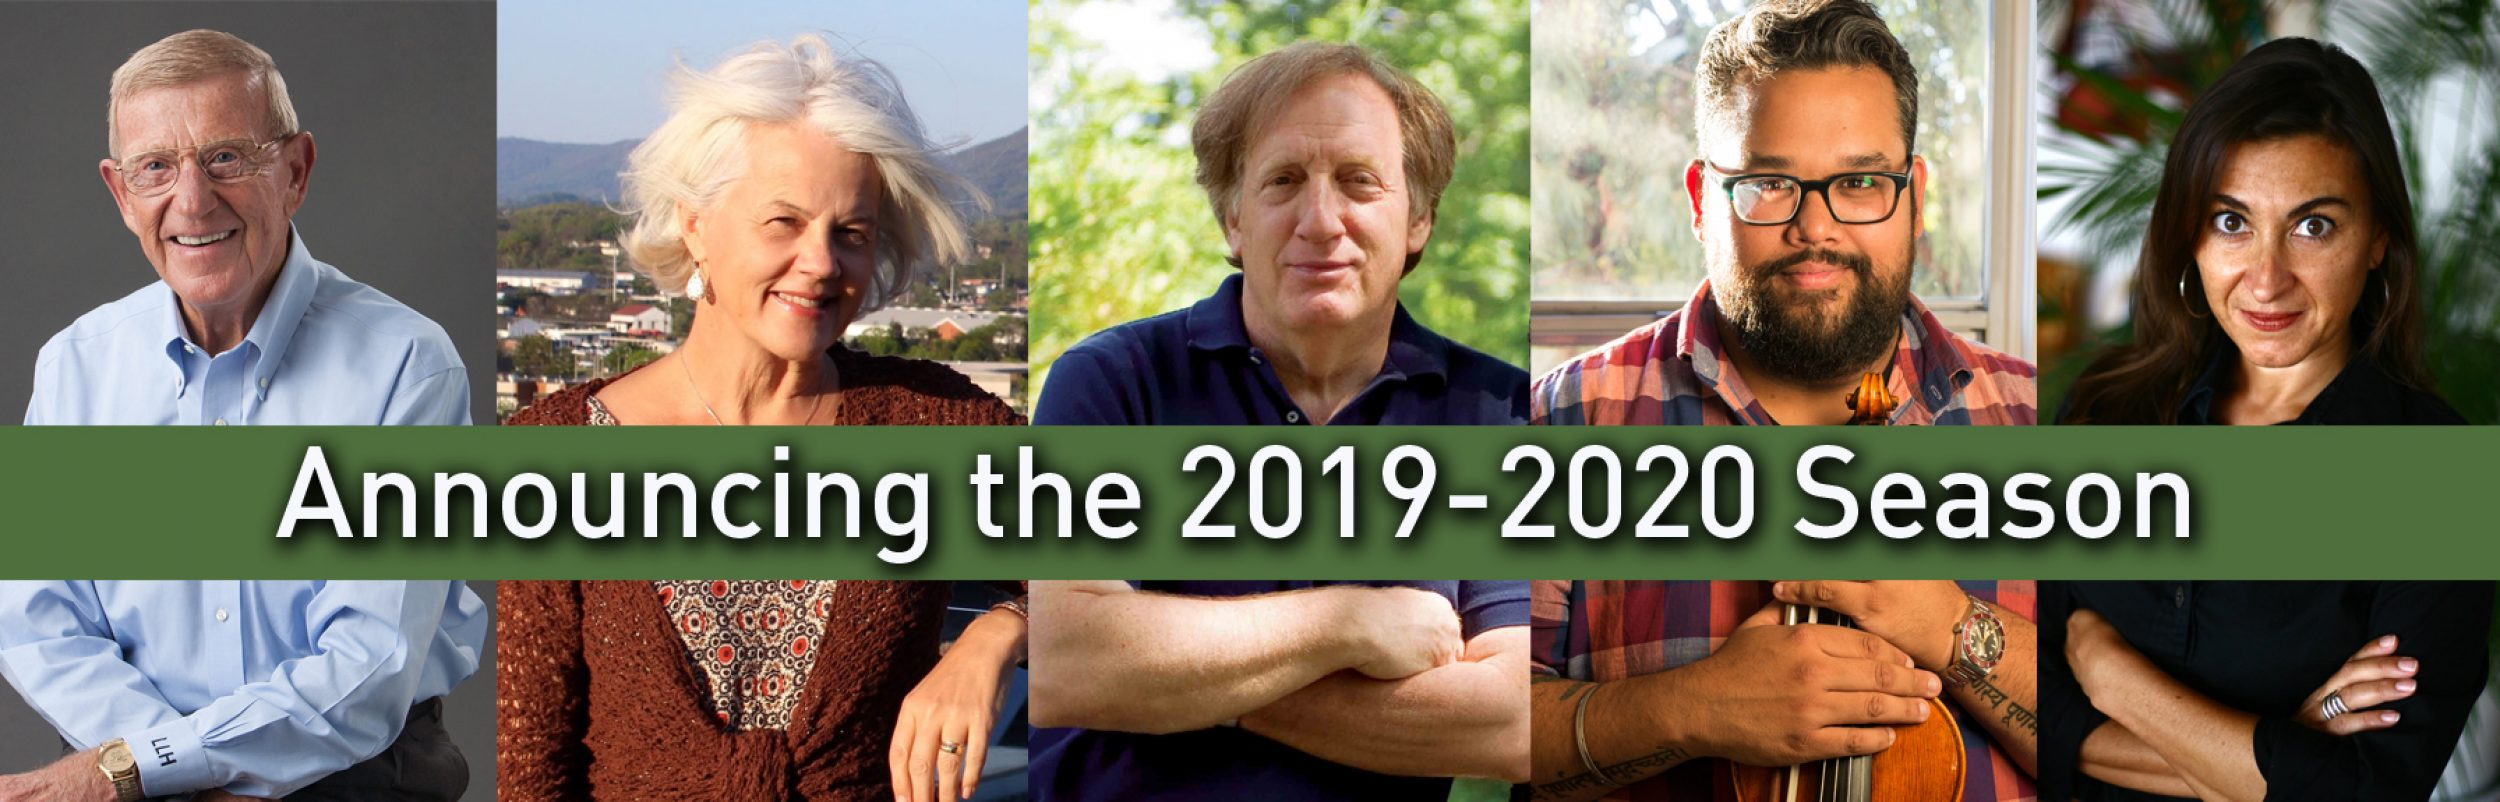 THS_2019-2020_headerImage